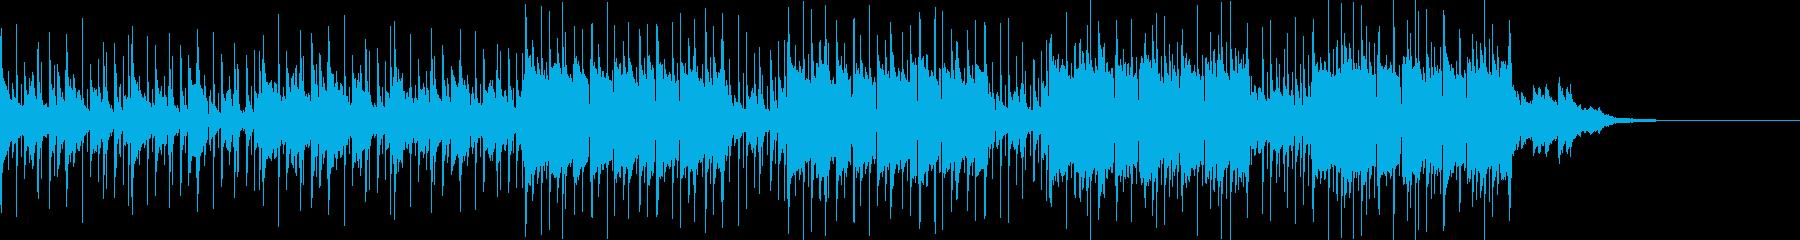 Pf「交易」和風現代ジャズの再生済みの波形